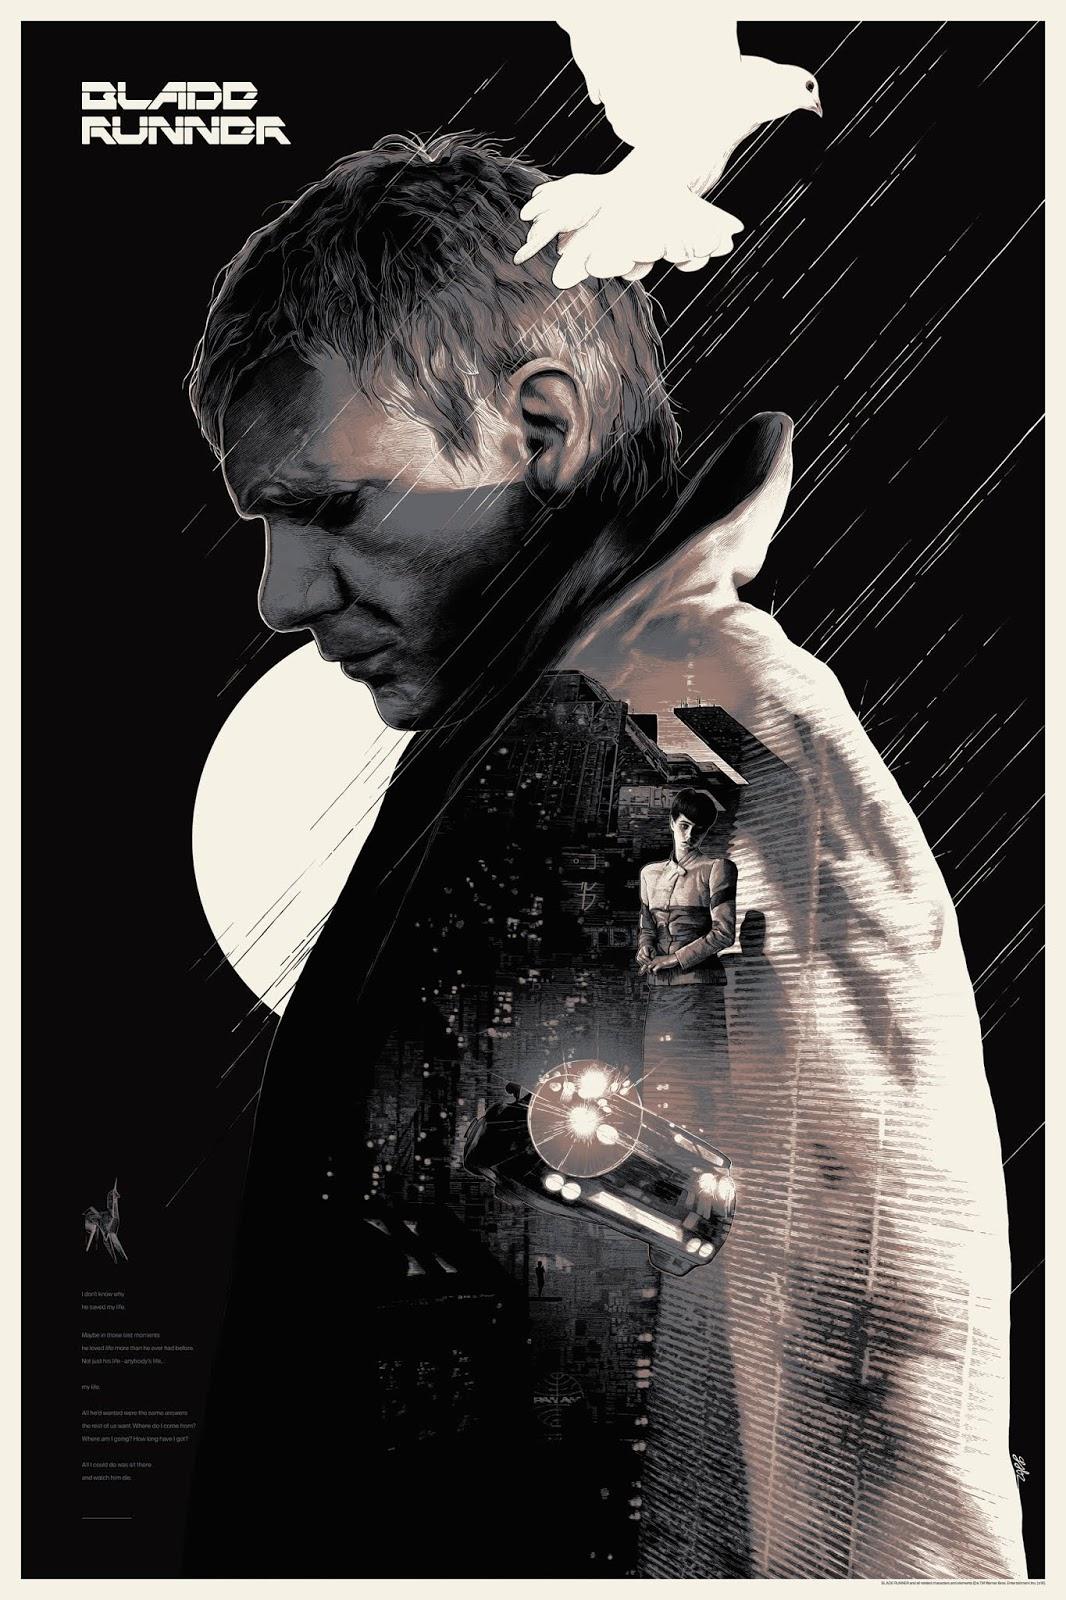 The Geeky Nerfherder Coolart Bottleneck Gallery Nycc Online Print Legend Of Five Rings Tears Amaterasu Exp Blade Runner Regular Edition By Grzegorz Domaradzki